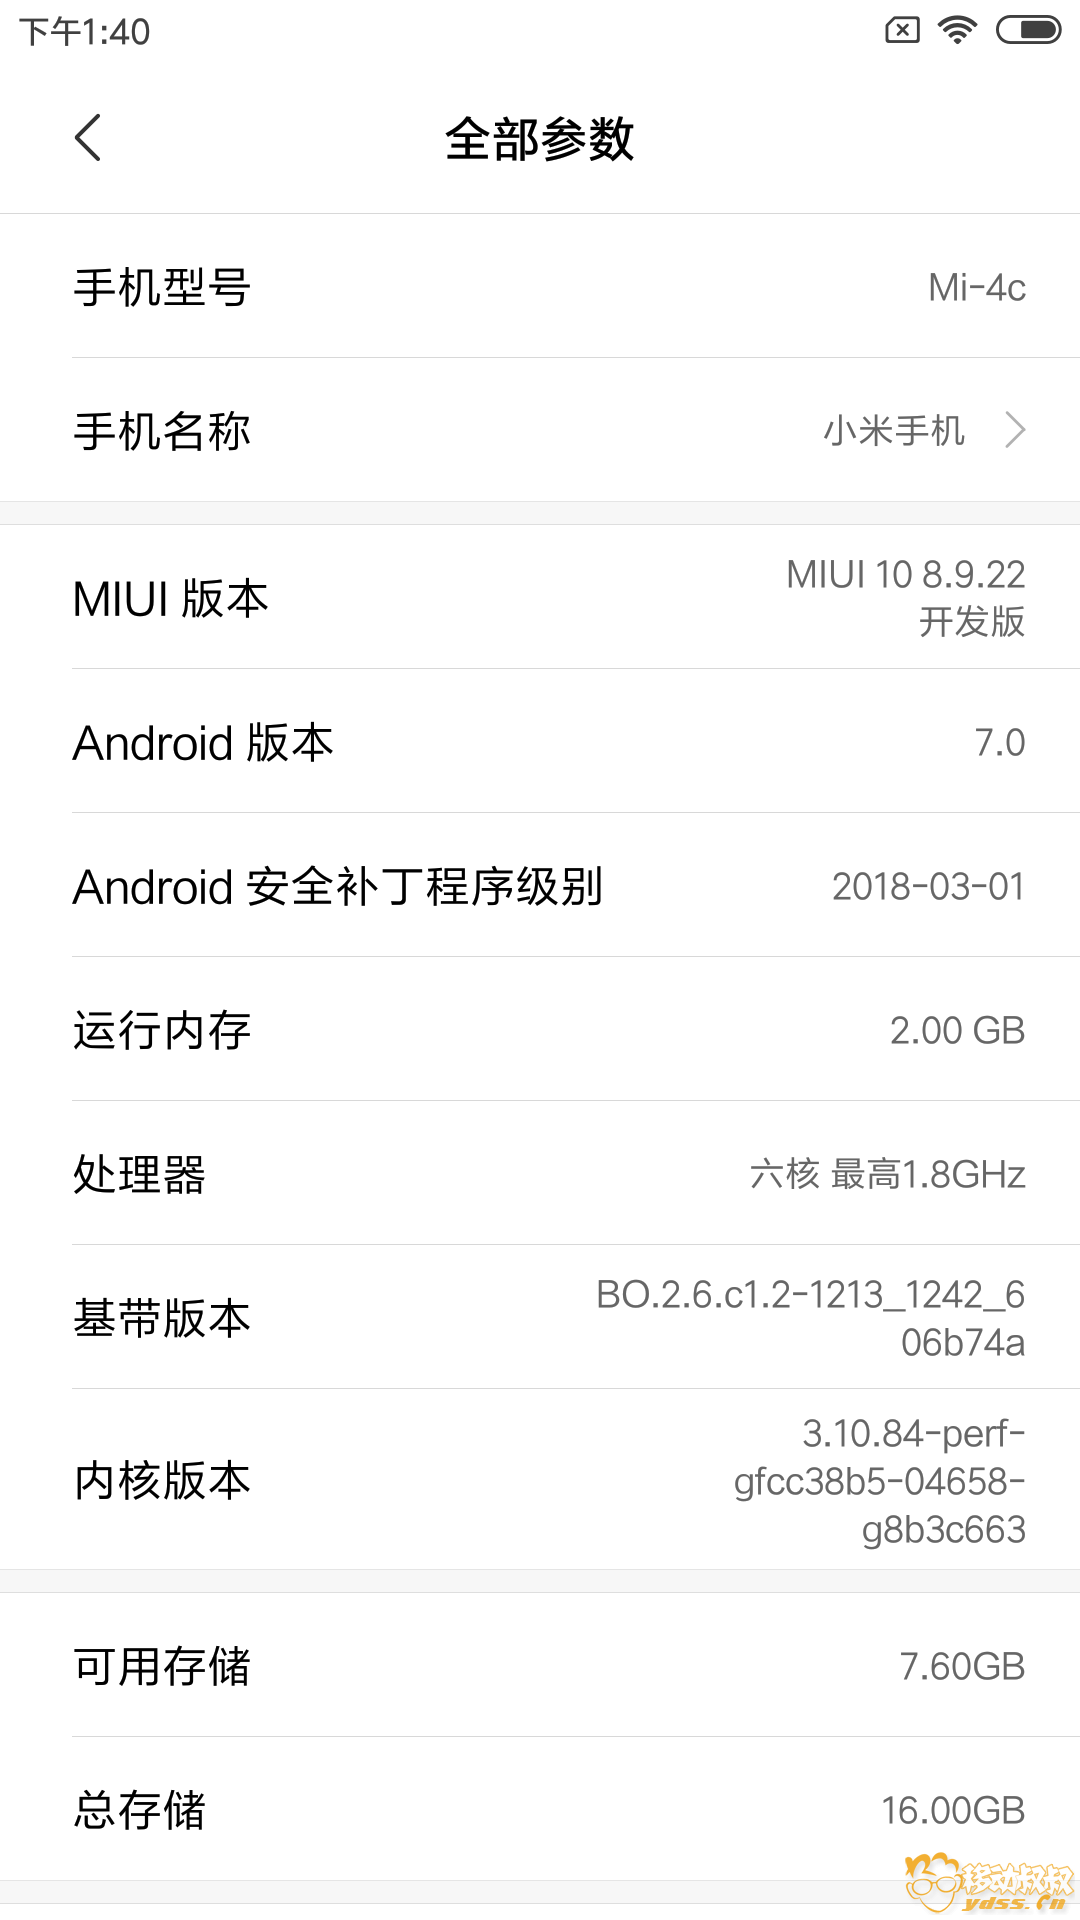 Screenshot_2018-09-23-13-40-48-388_com.android.settings.png